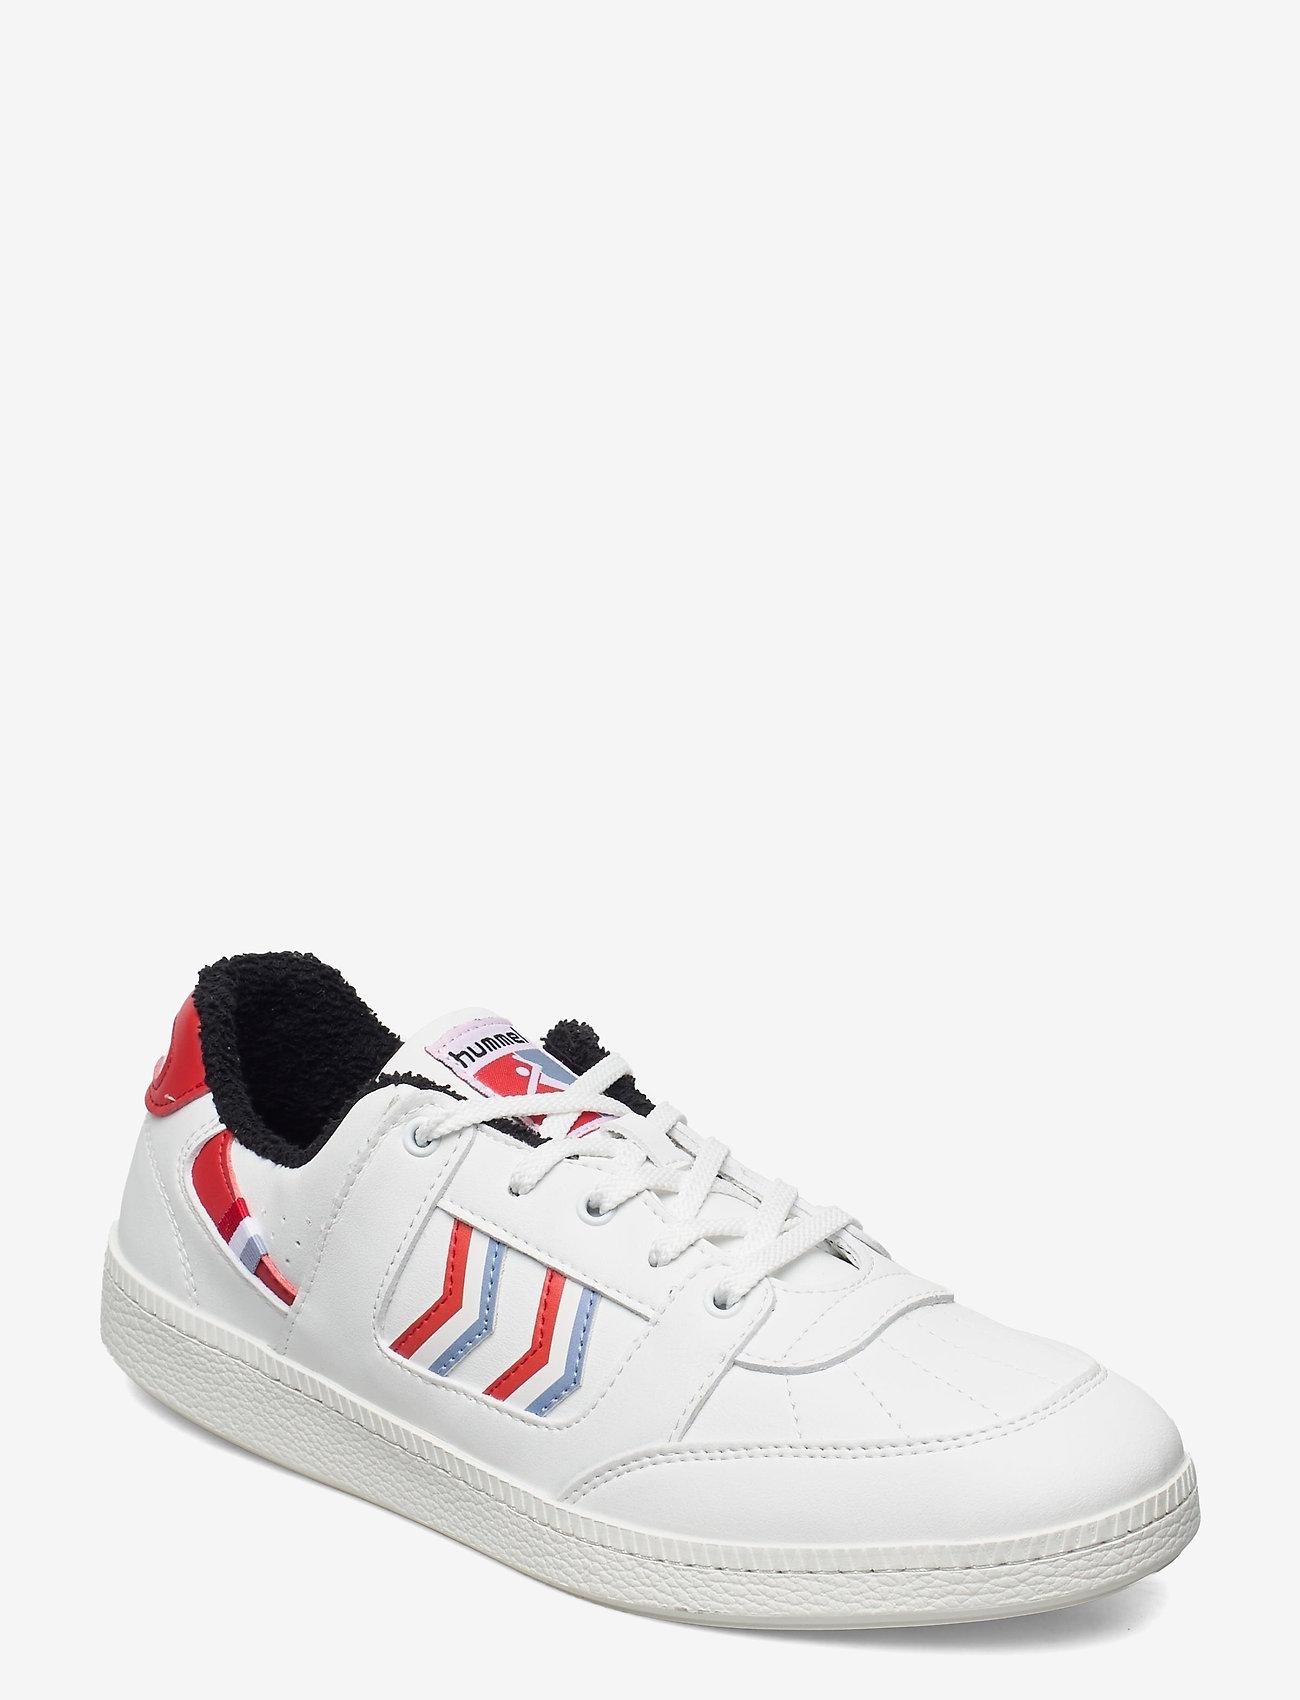 Hummel - SEOUL VEGAN ARCHIVE - laag sneakers - white/fiery red - 1